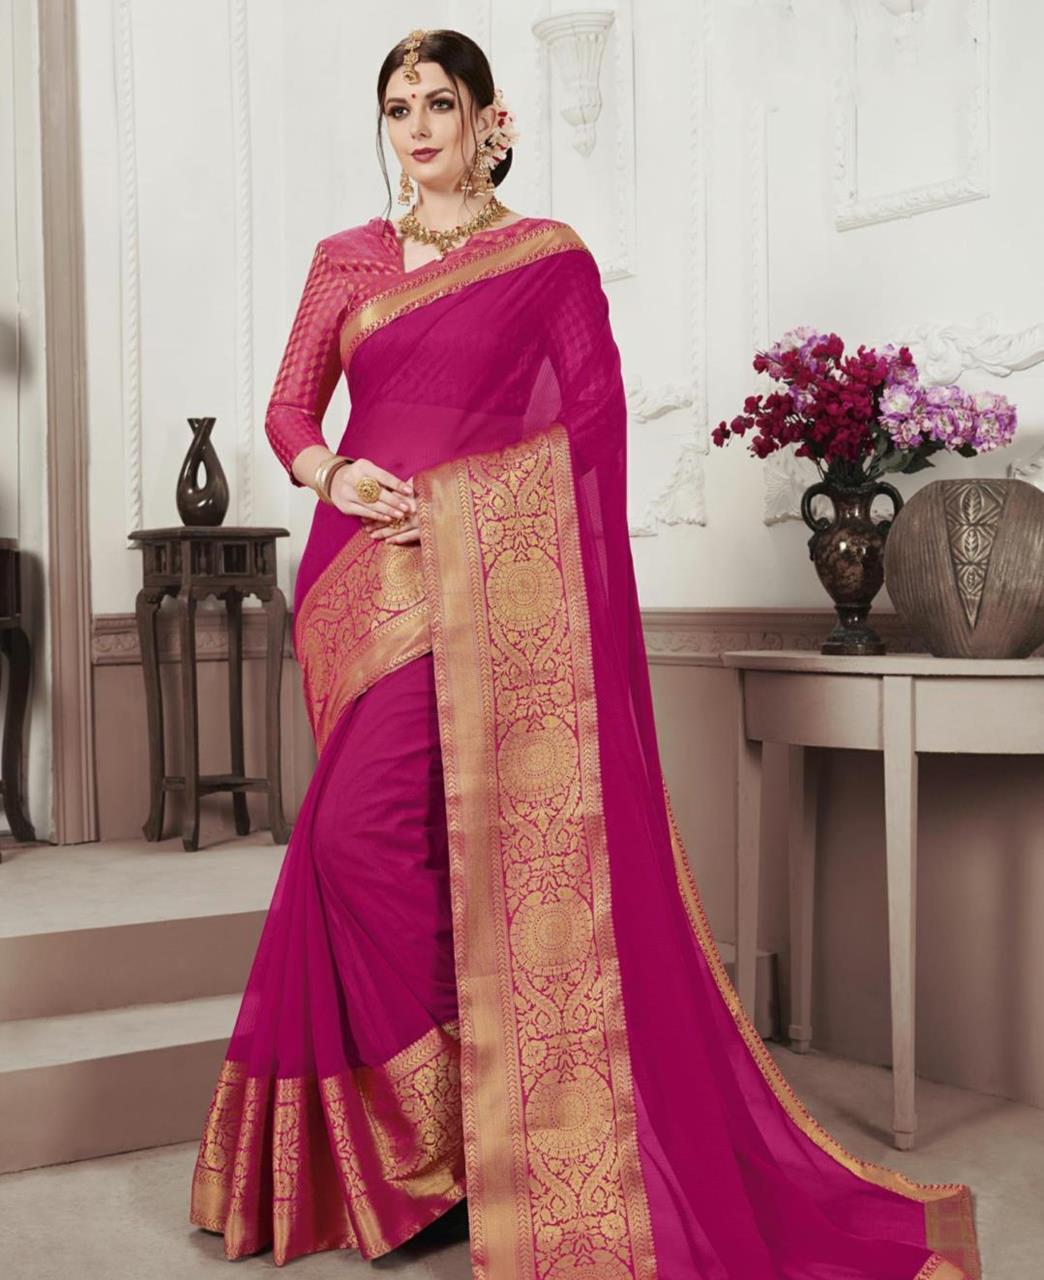 Woven Chiffon Saree (Sari) in Pink